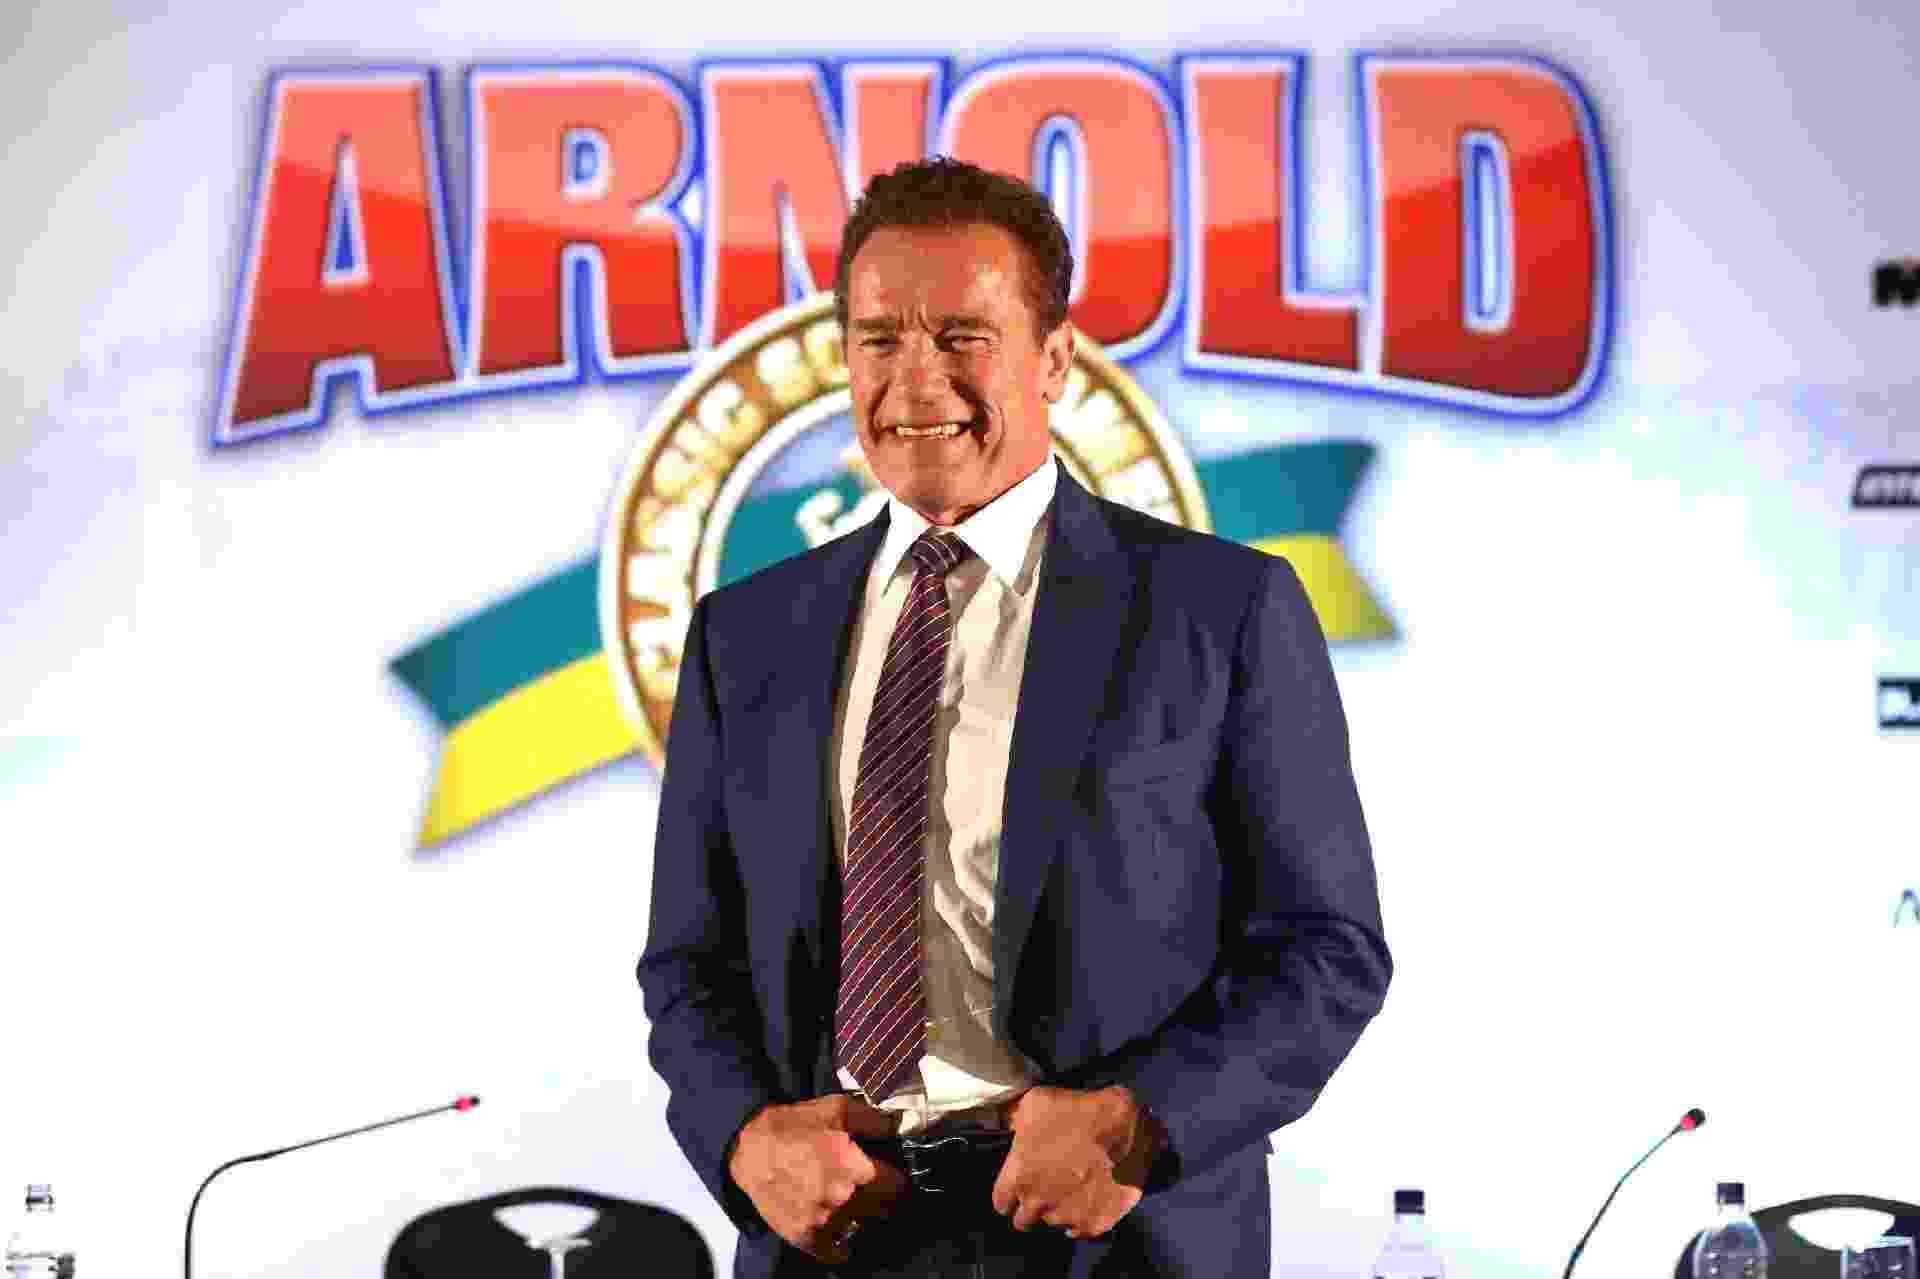 Arnold Schwarzenegger faz pose em entrevista coletiva no Arnold Classic South America - Manuela Scarpa/Brazil News